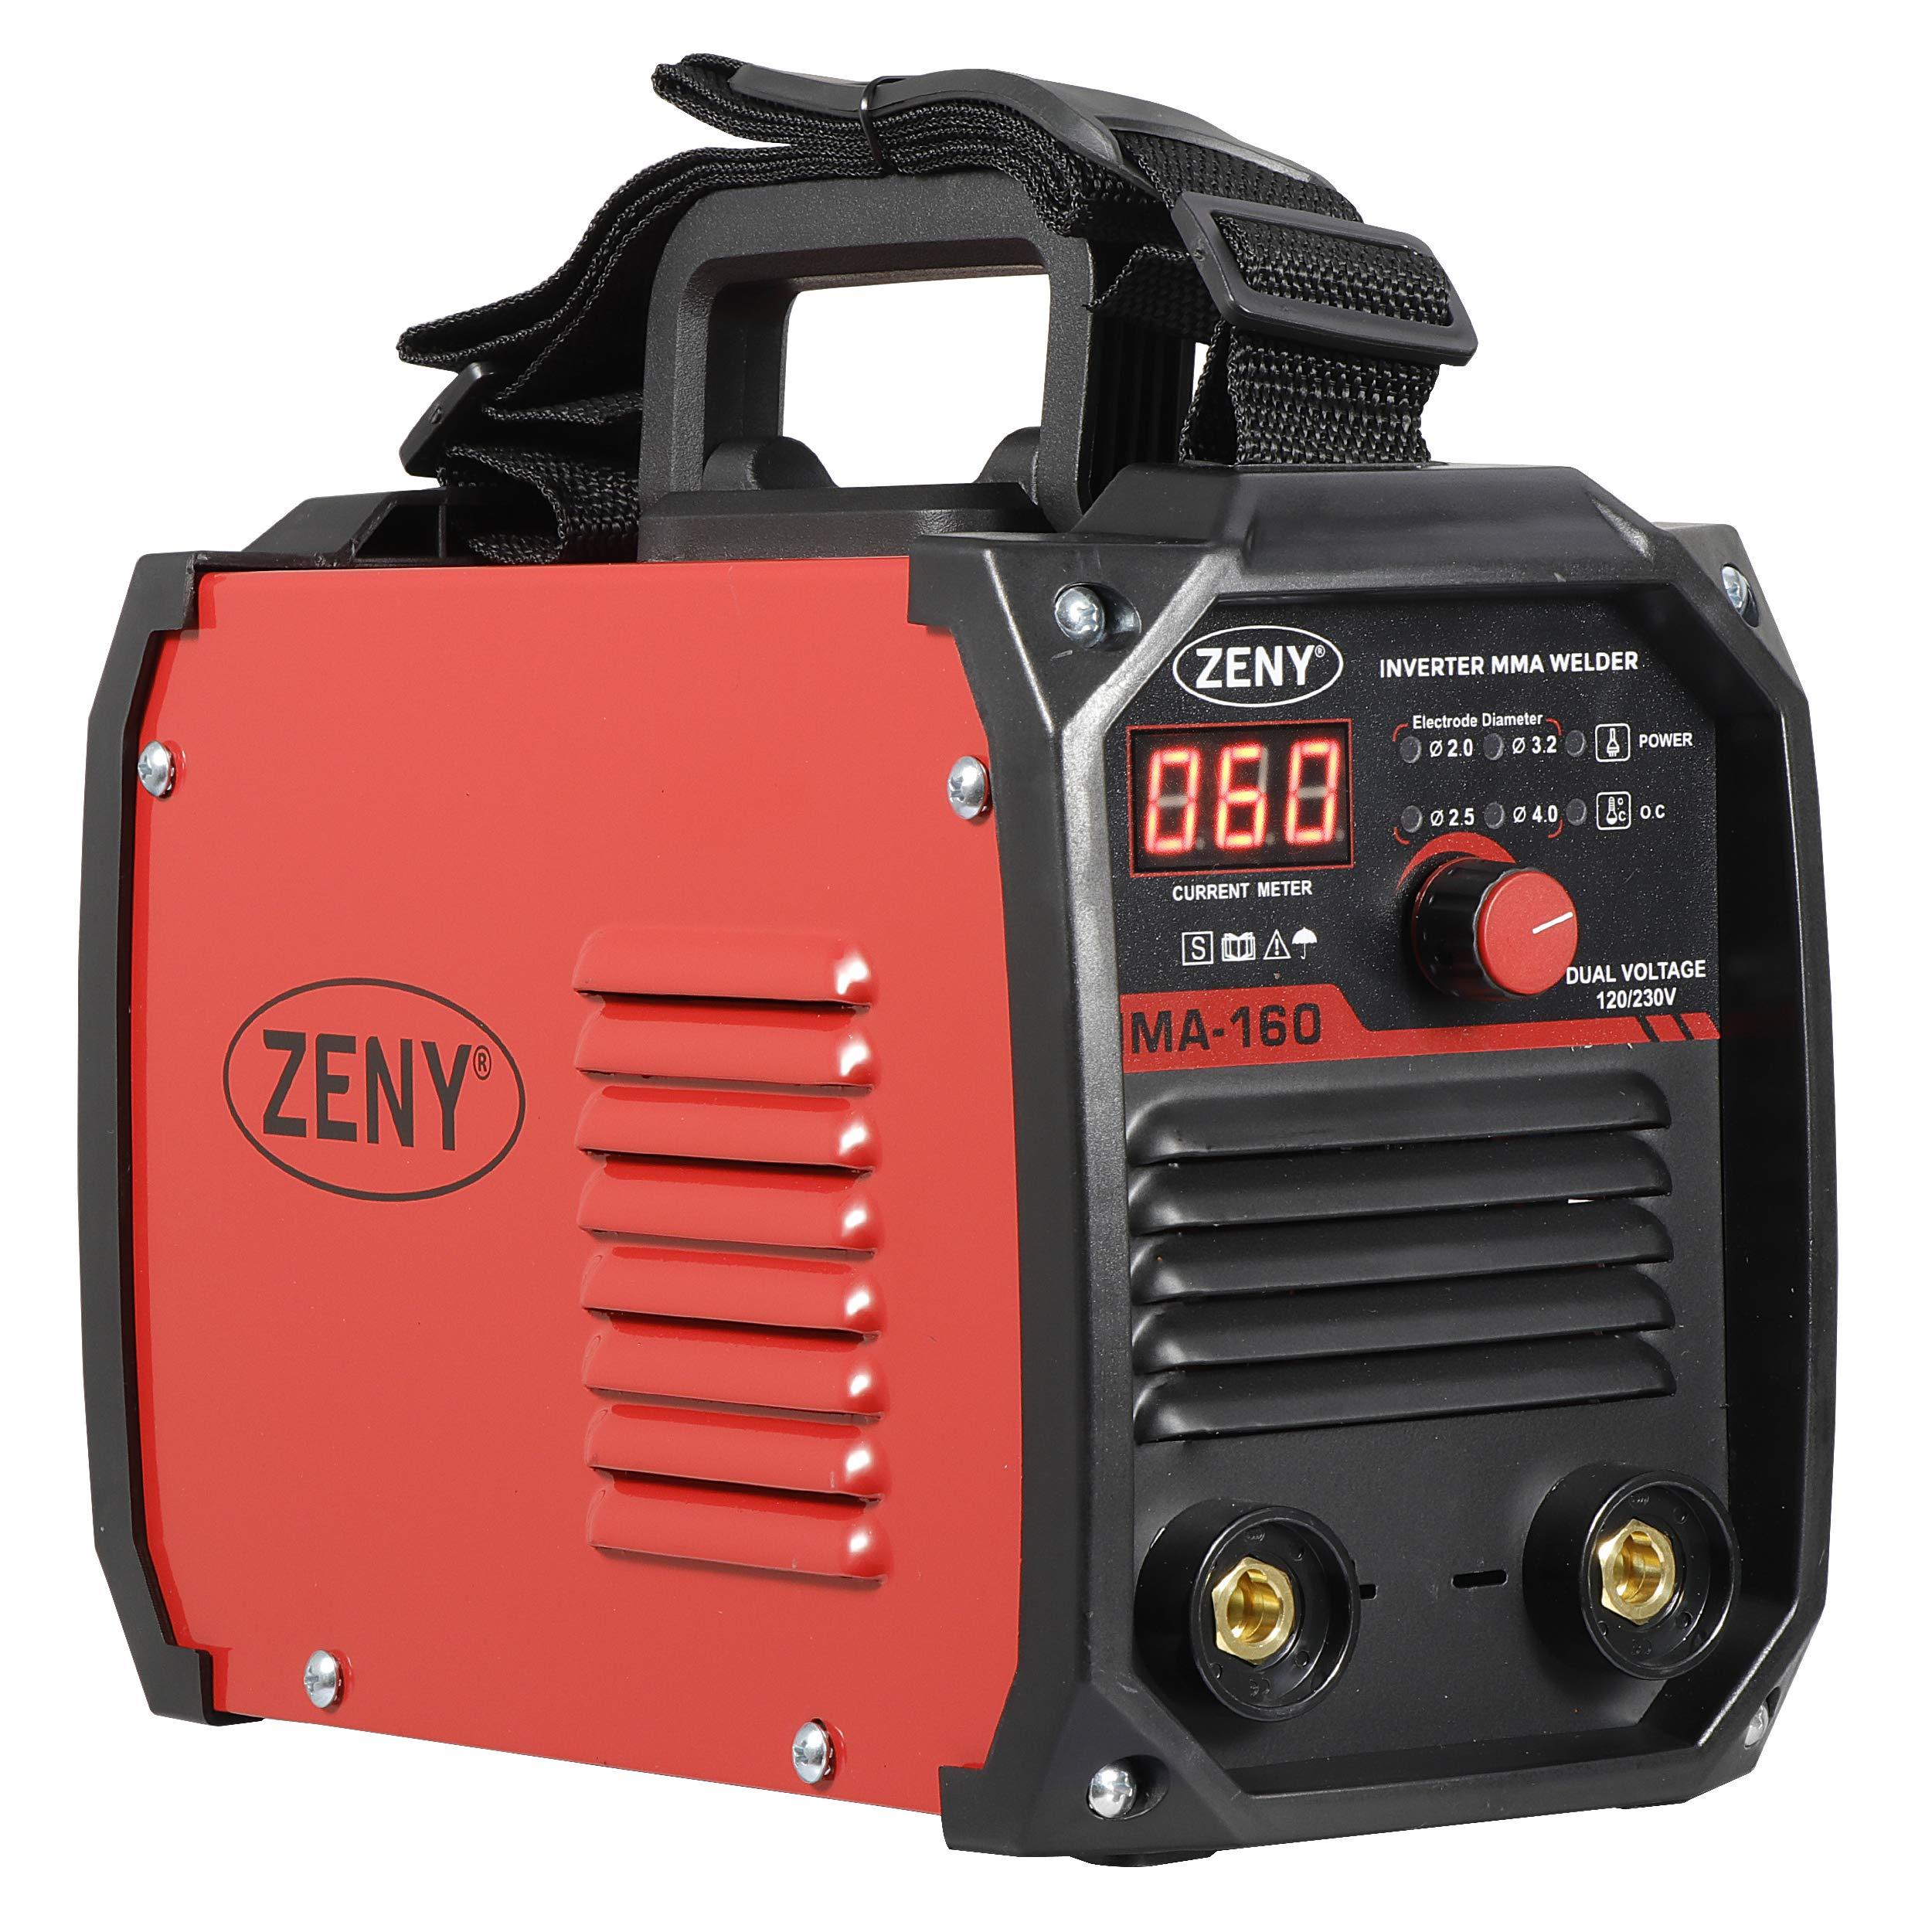 ZENY Arc Welding Machine DC Inverter Dual Voltage 110/230V IGBT Welder 160 AMP Stick by ZENY